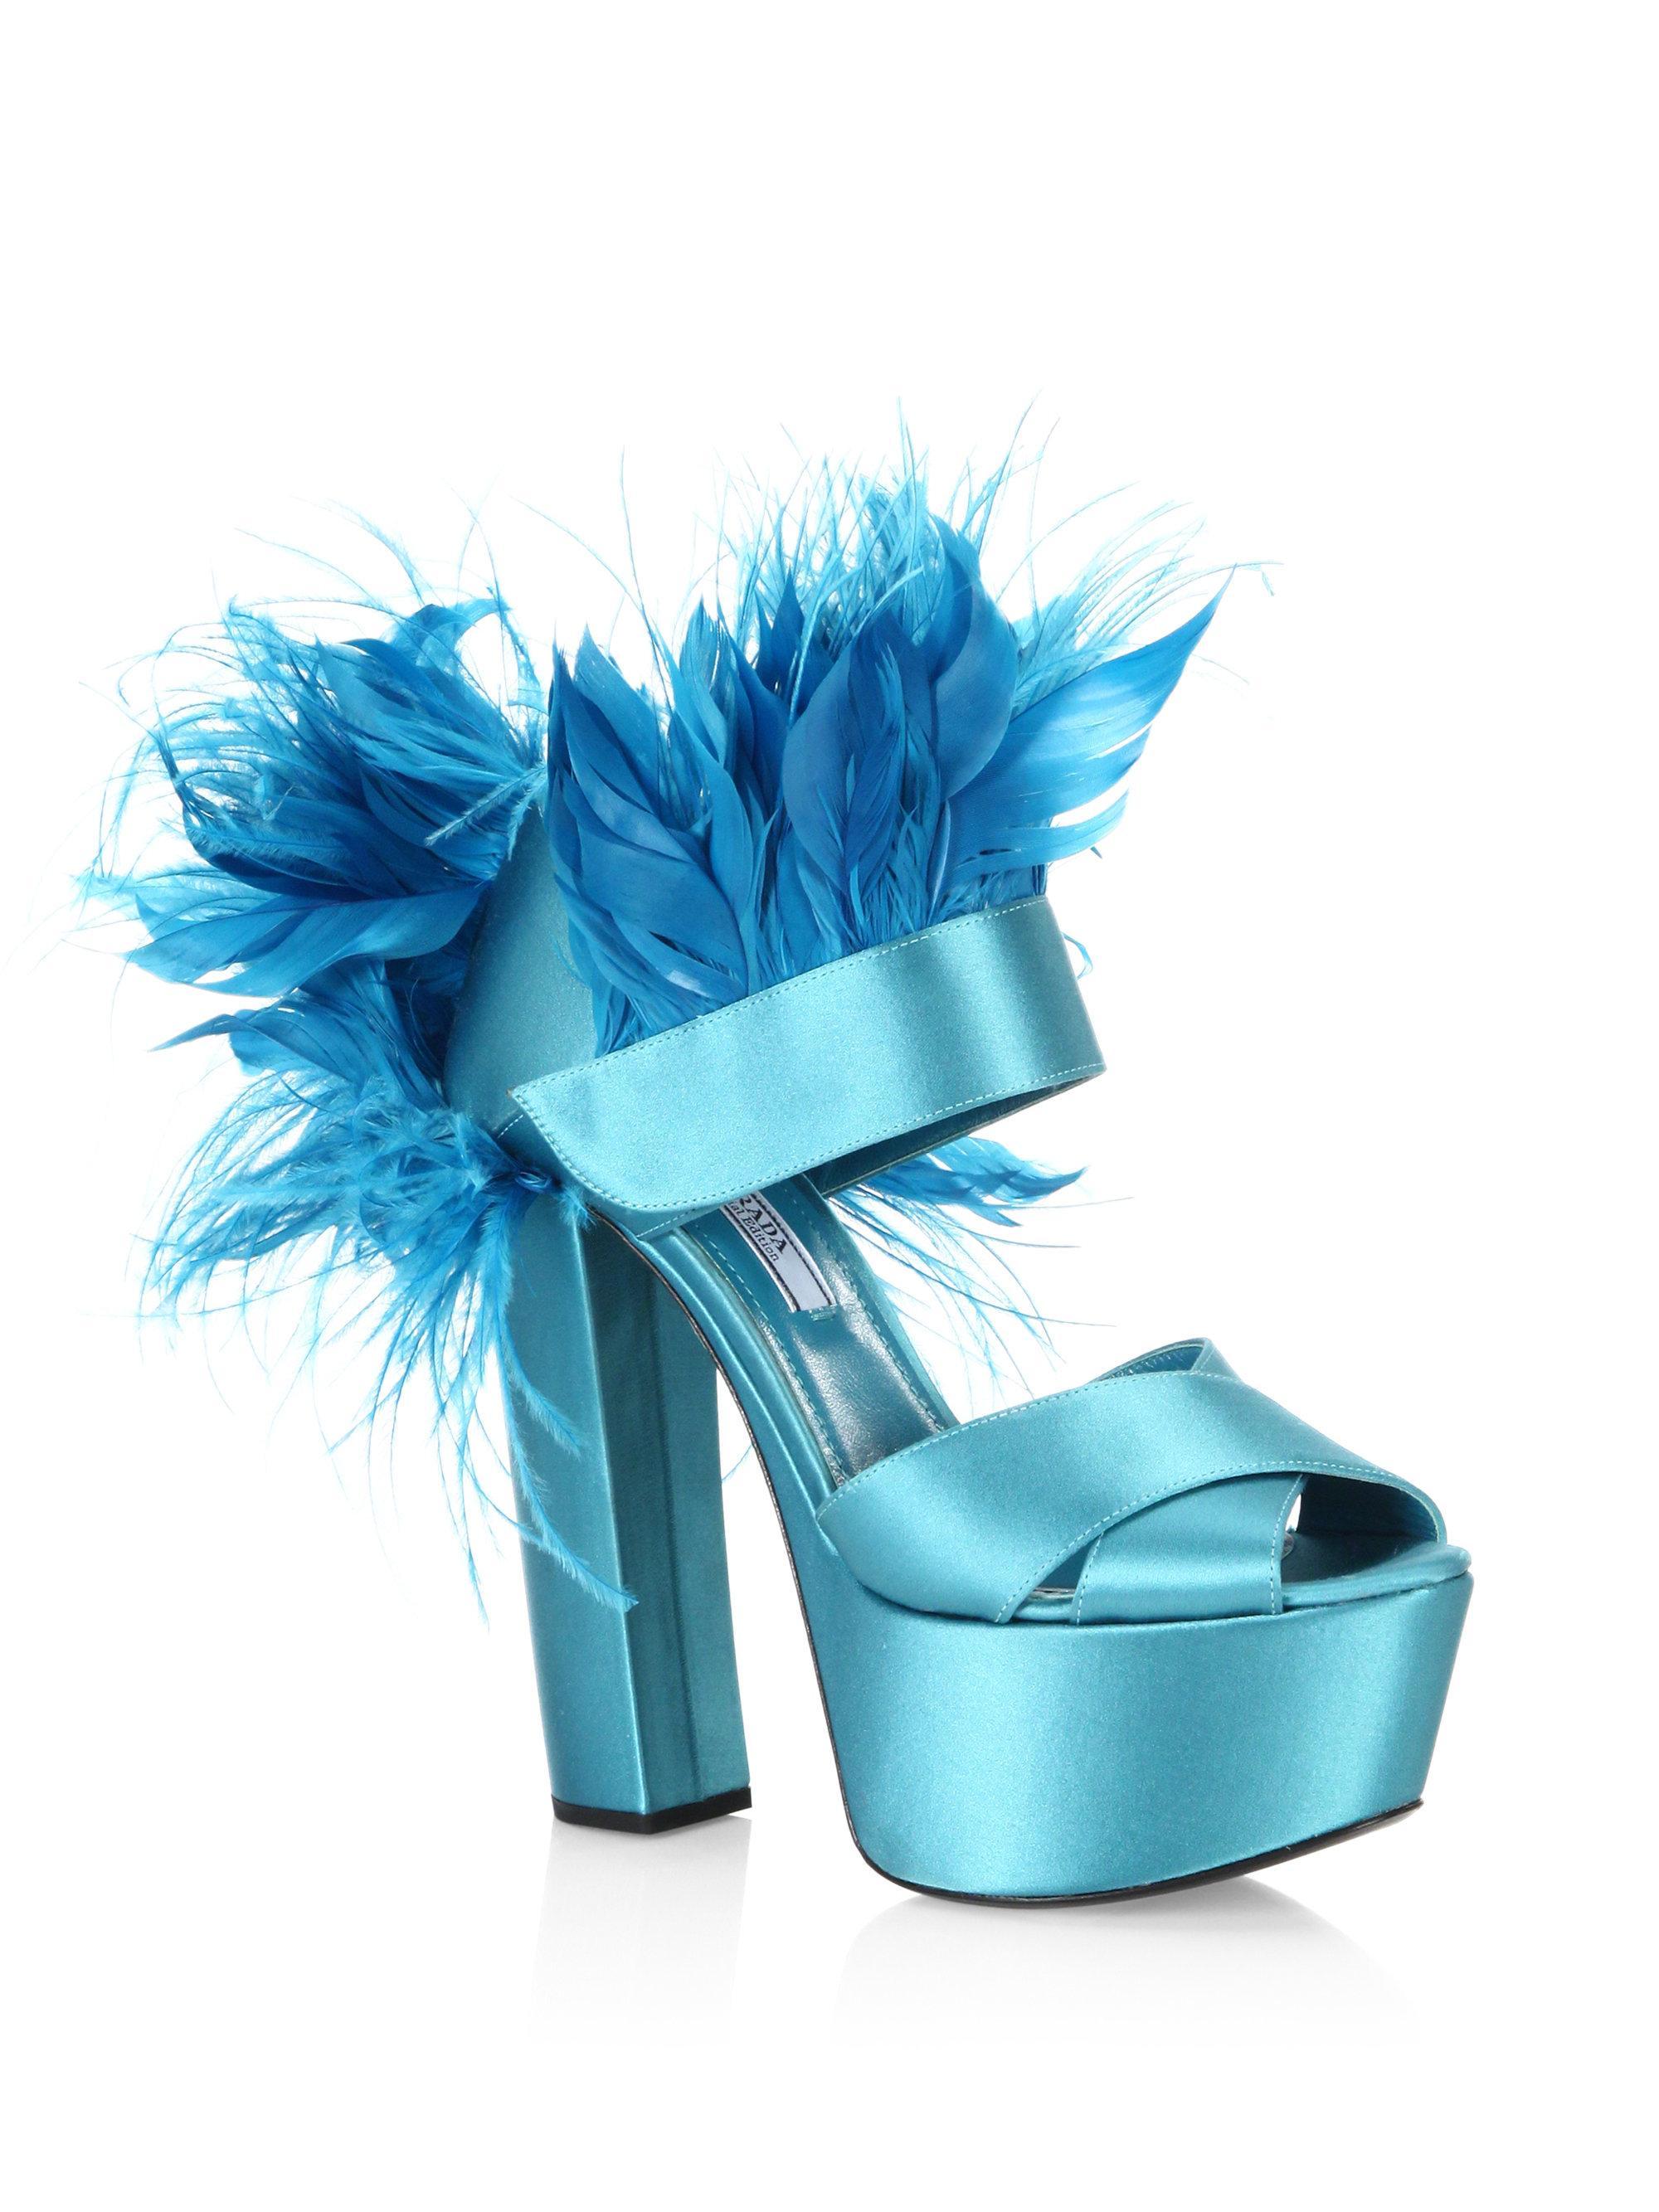 37097dc39a8 Lyst - Prada Feather-trim Satin Platform Sandals in Blue